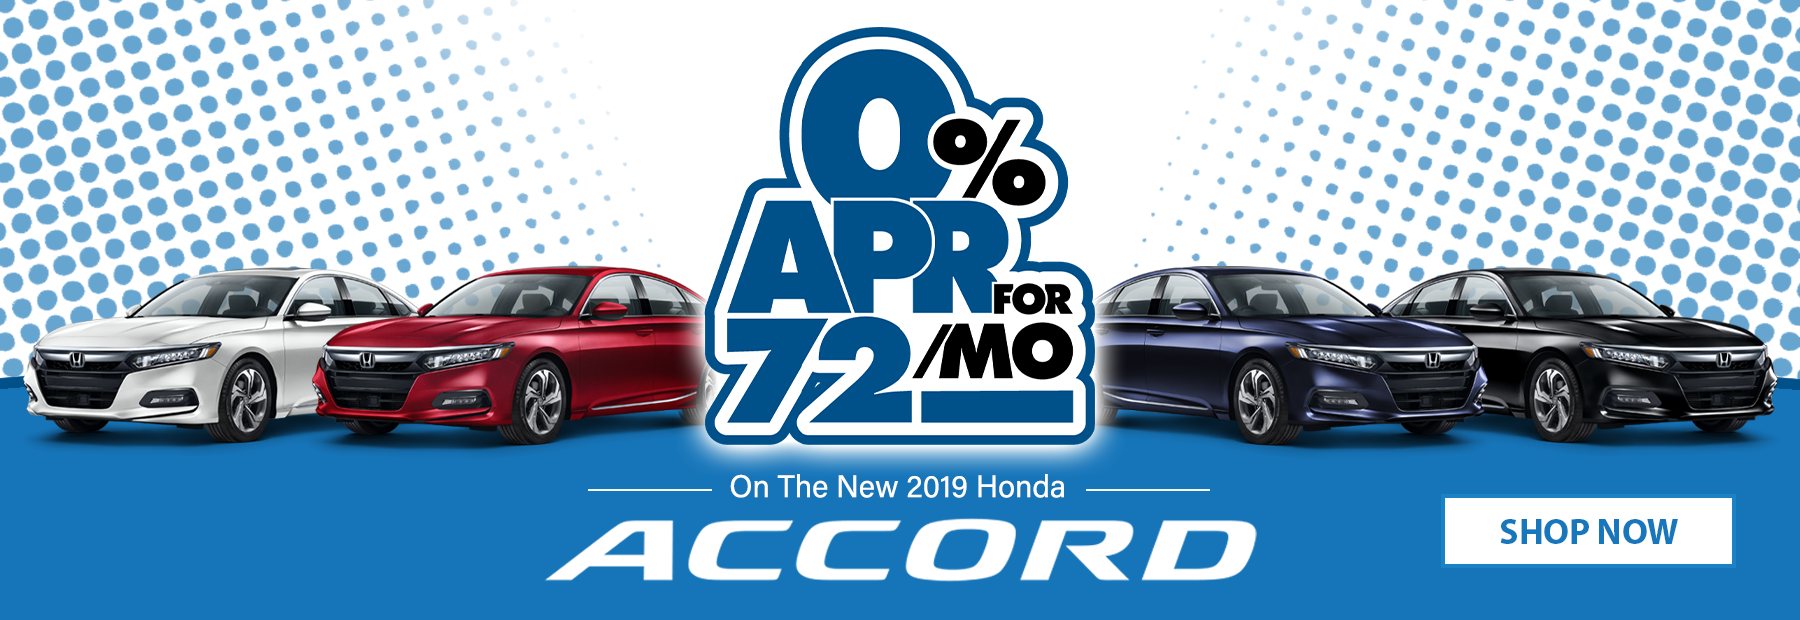 Honda Dealers Dayton Ohio >> Performance Honda New Honda Sales Service Route 4 In Fairfield Oh